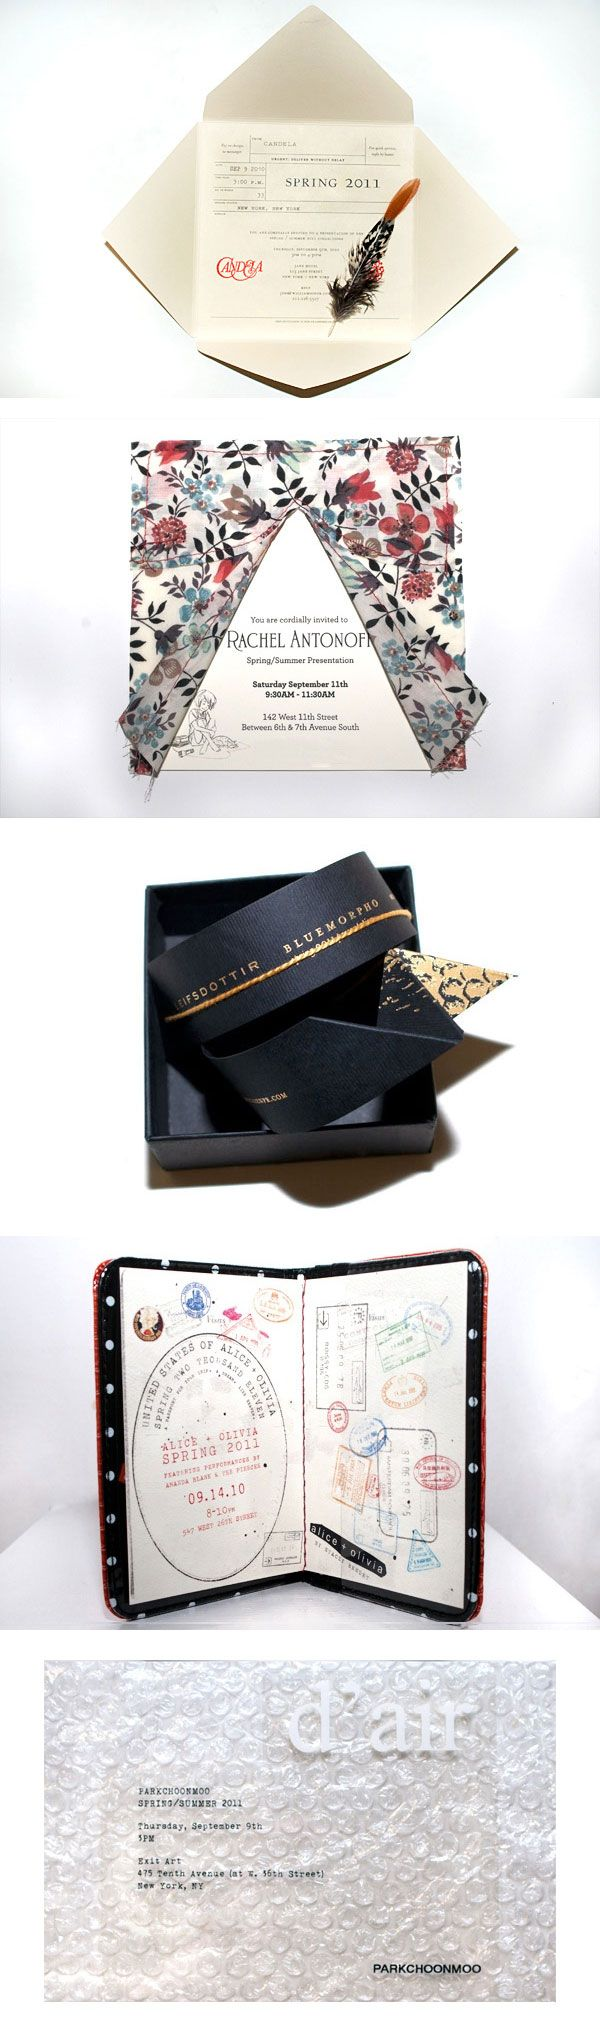 Fashion Week invitations